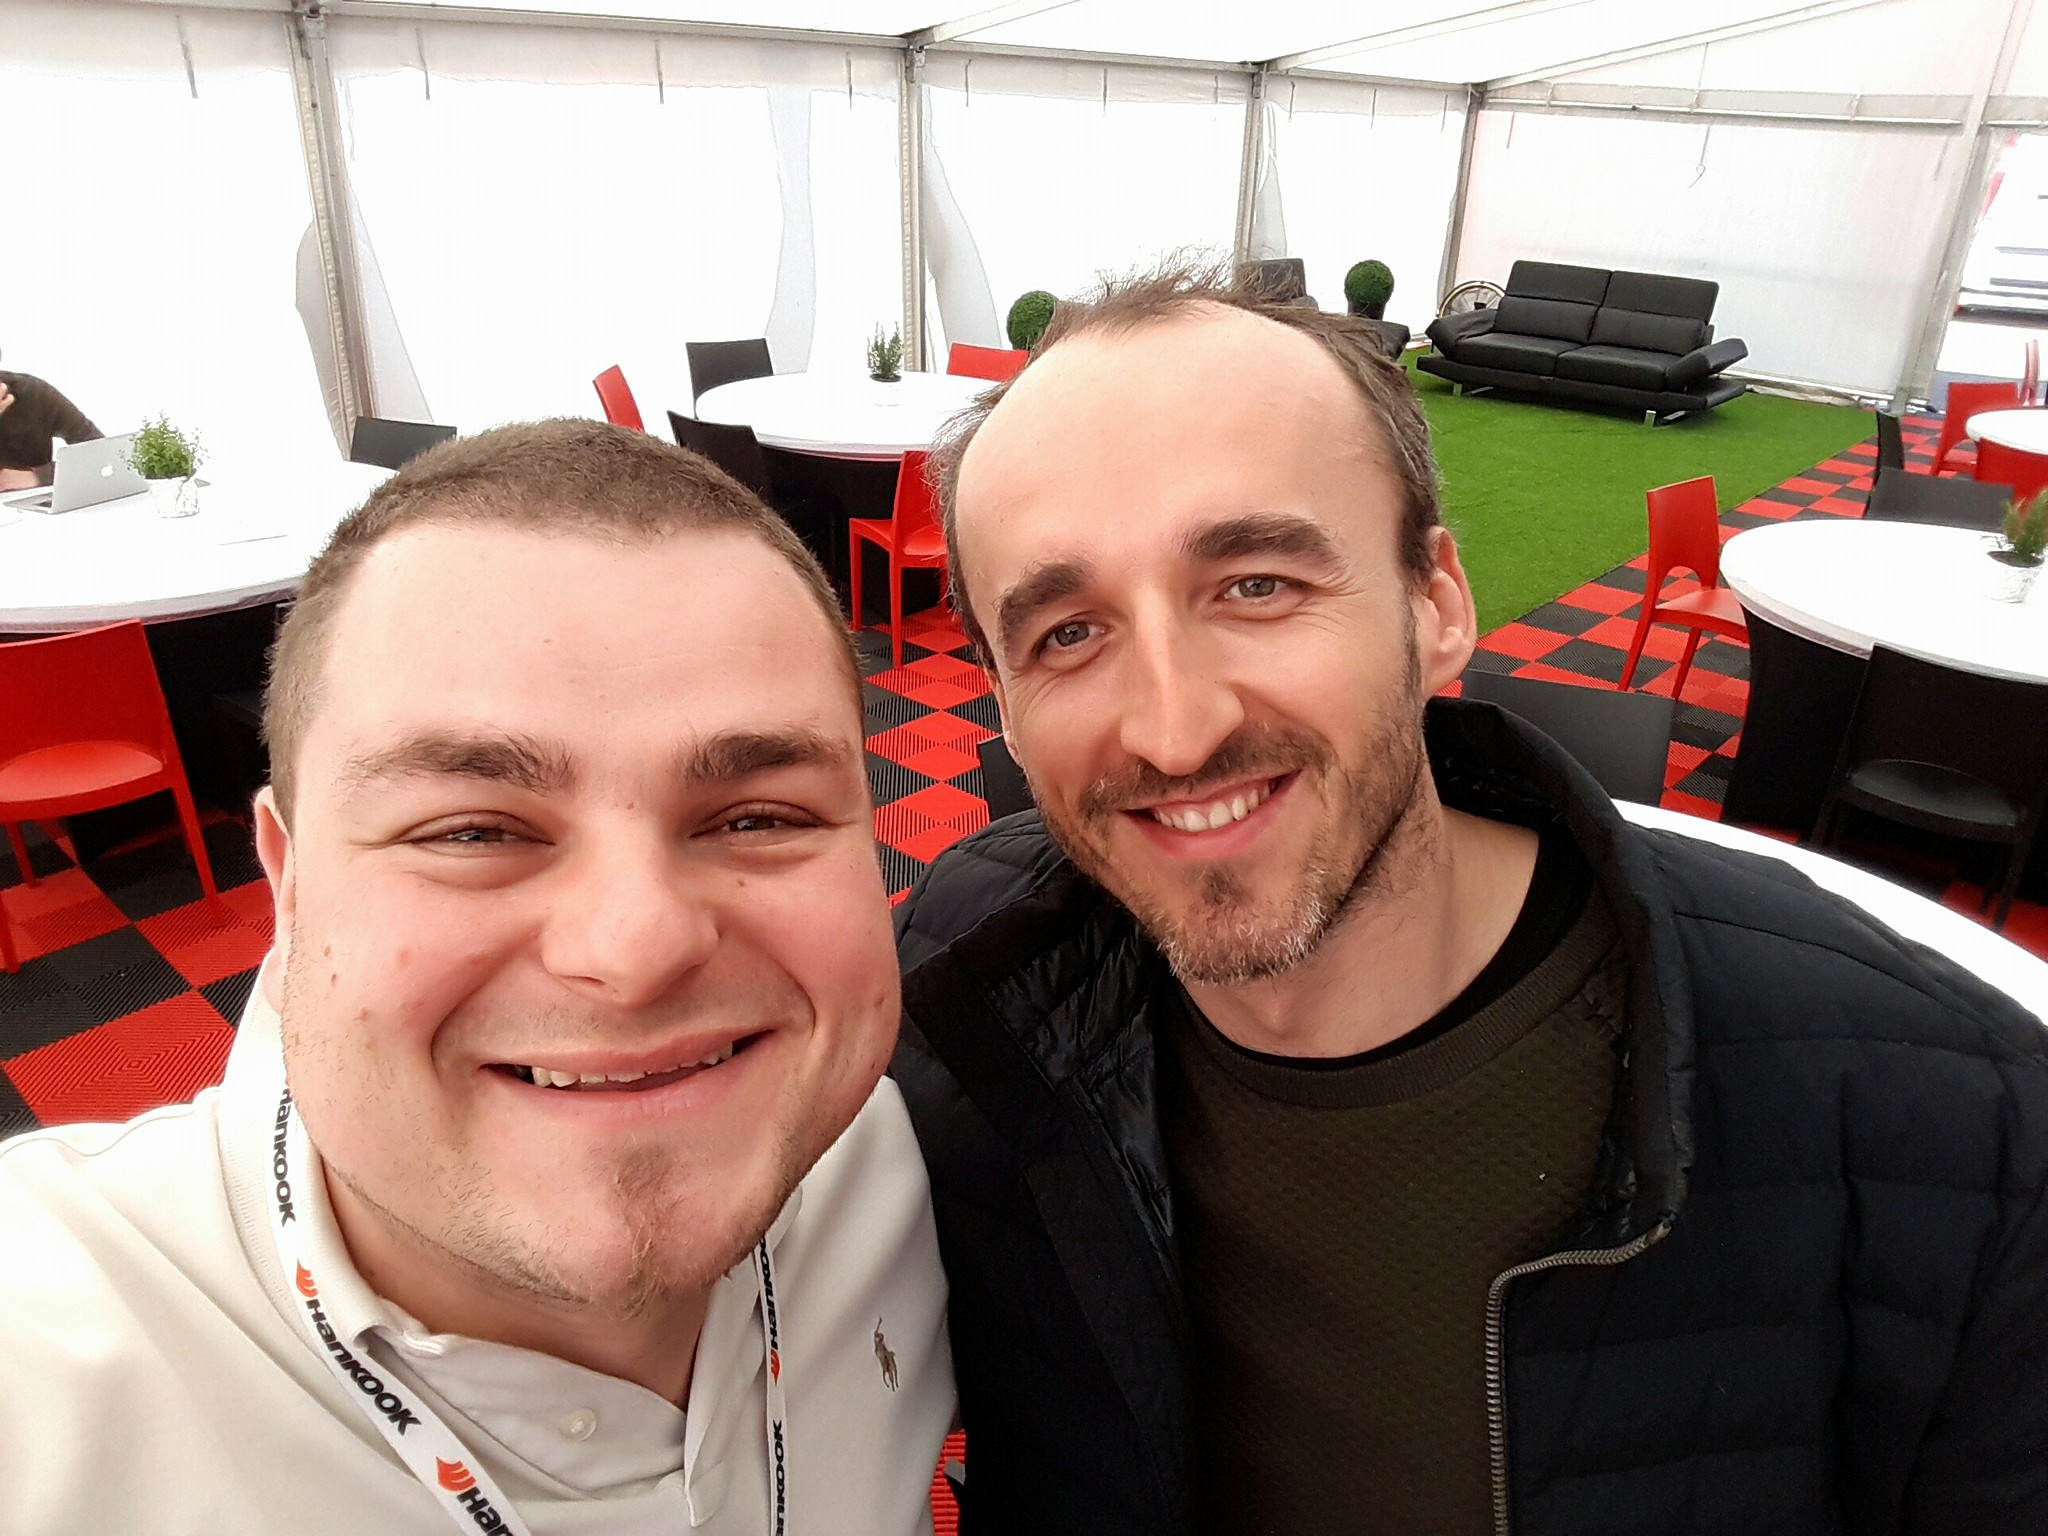 Michał Bałazy kucharz Förch Racing powered by Olimp i Robert Kubica podczas 12h Mugello